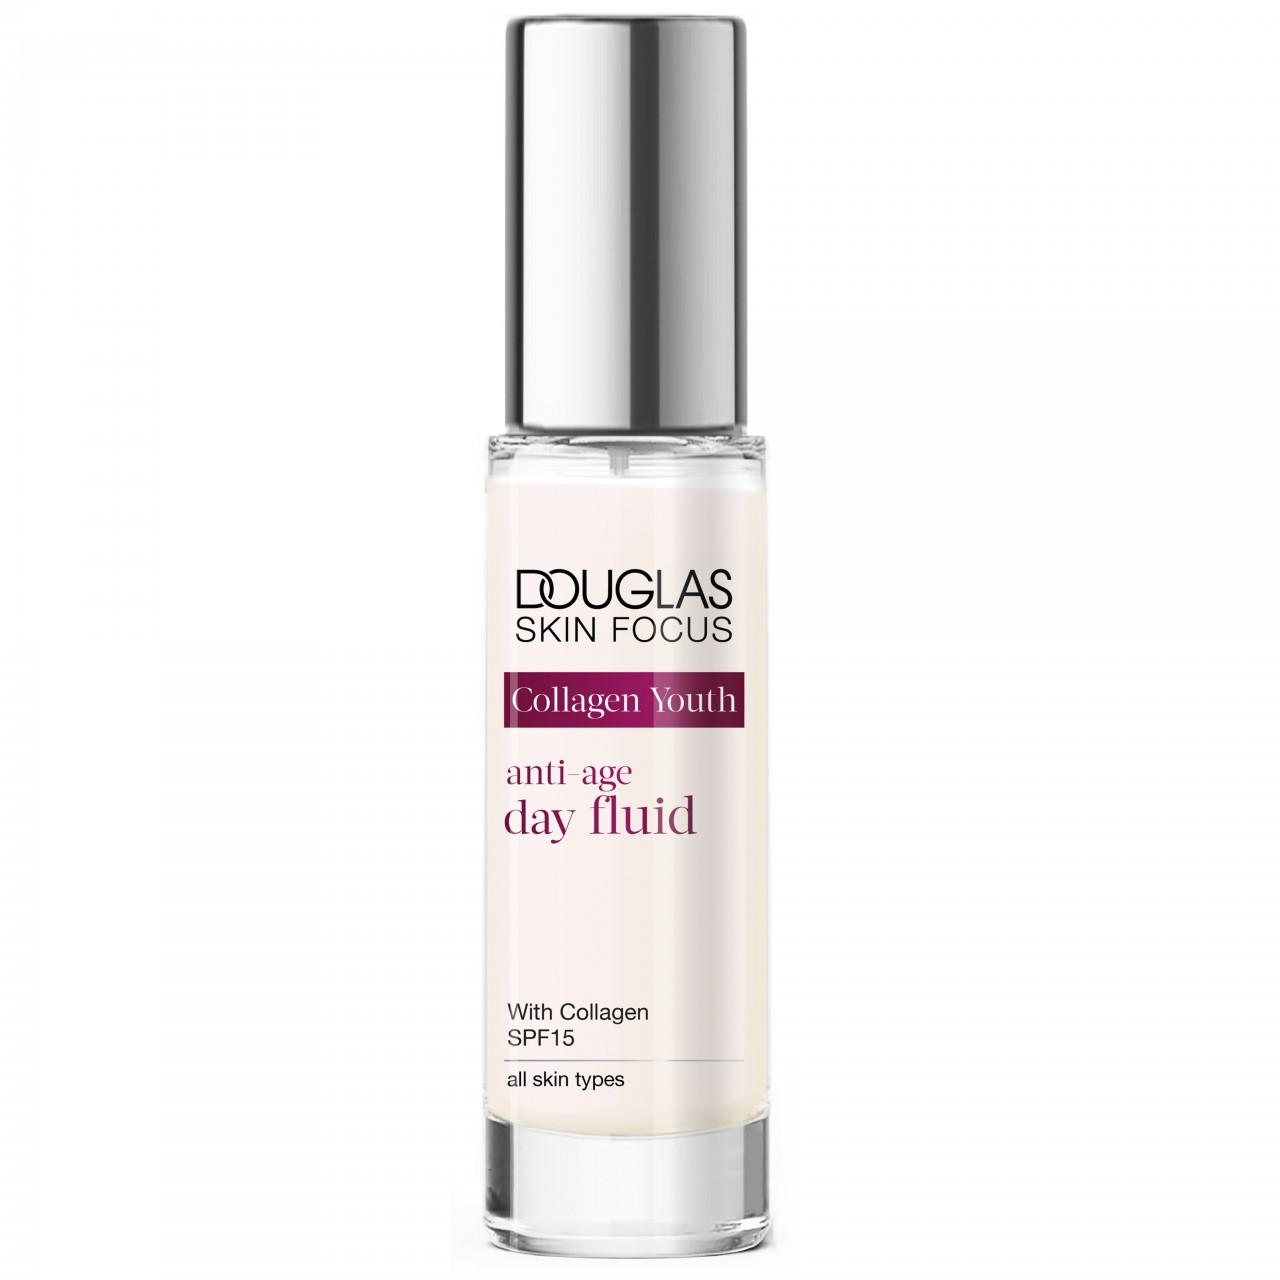 Douglas Focus Anti-Age Day Fluid SPF15